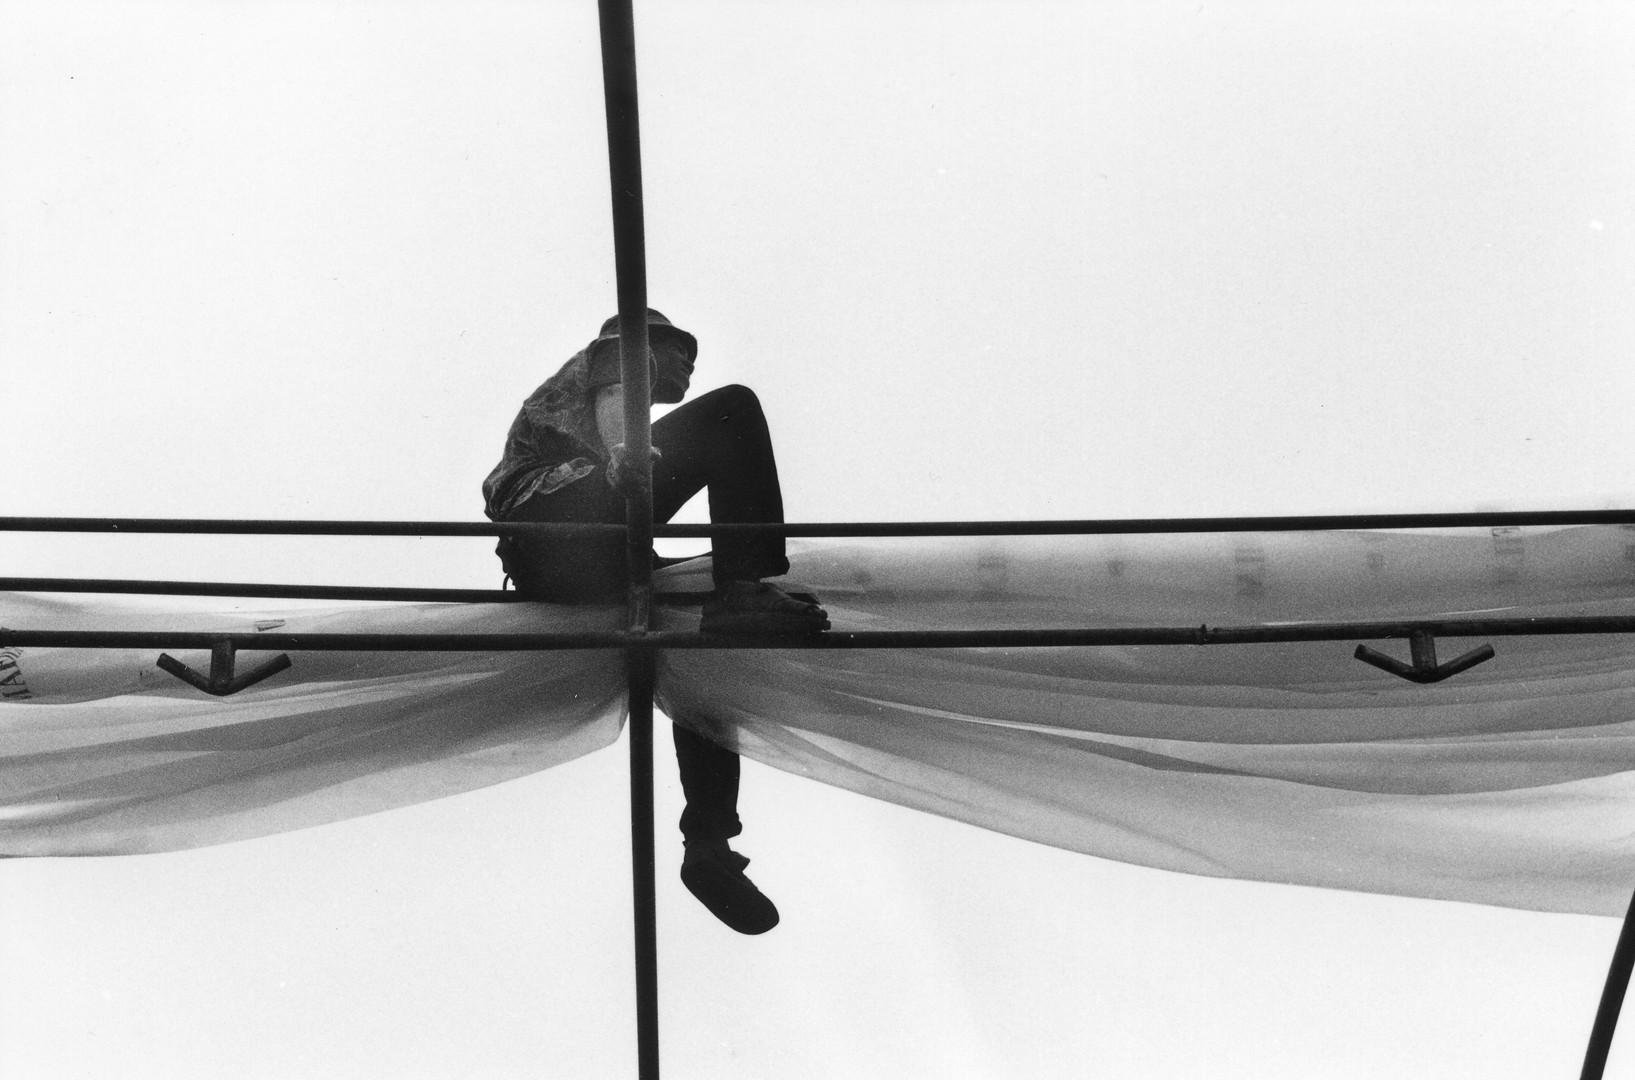 acrobaties rurales #12